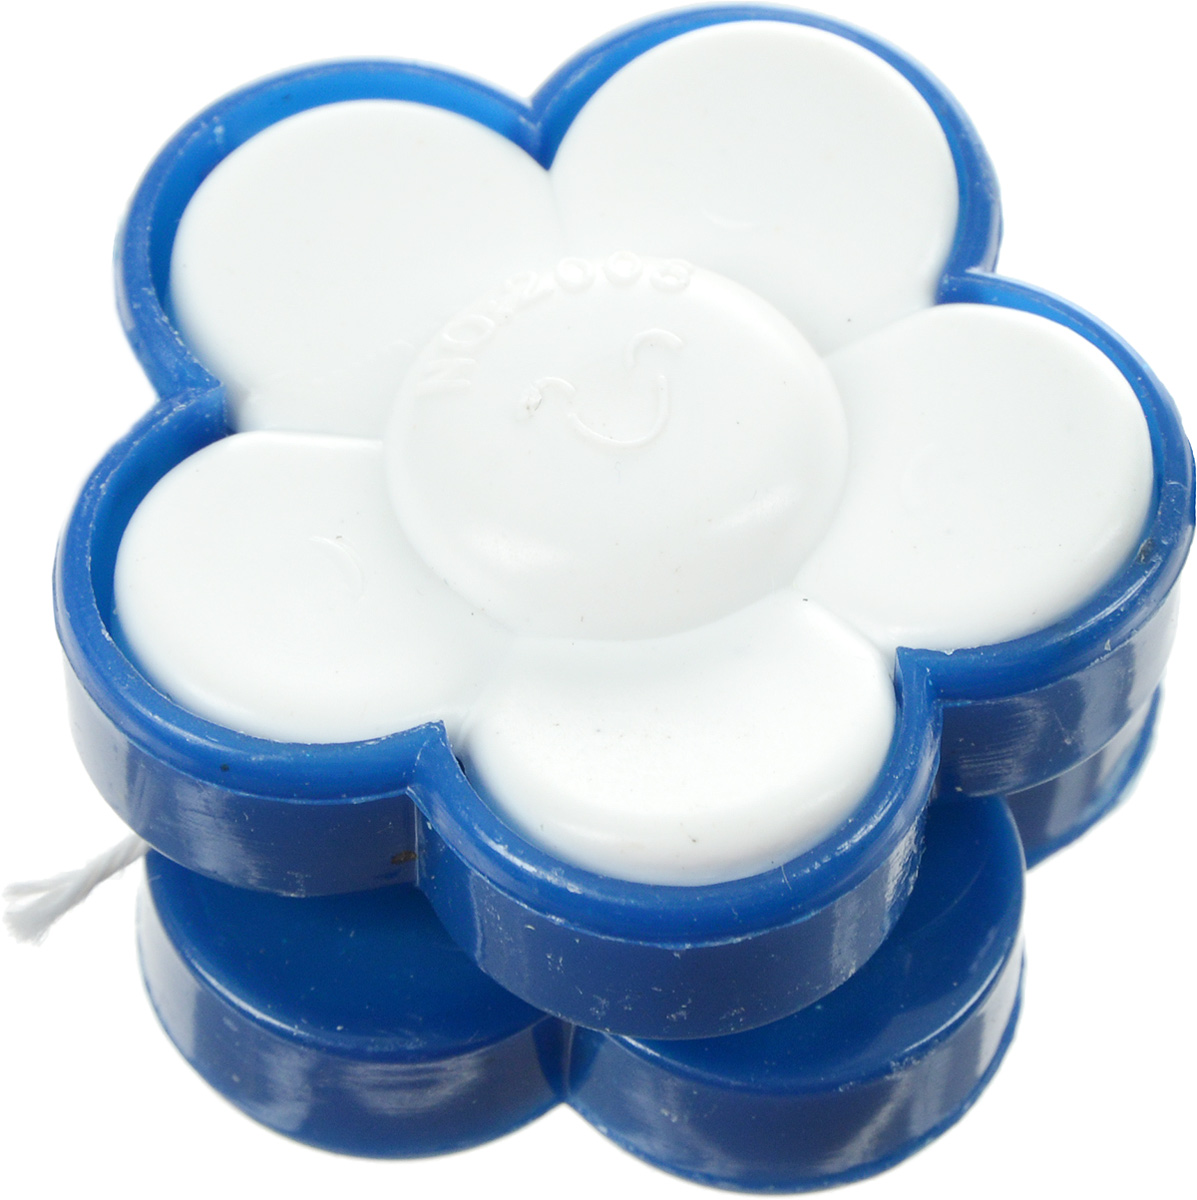 Sima-land Йо-йо Цветок цвет синий